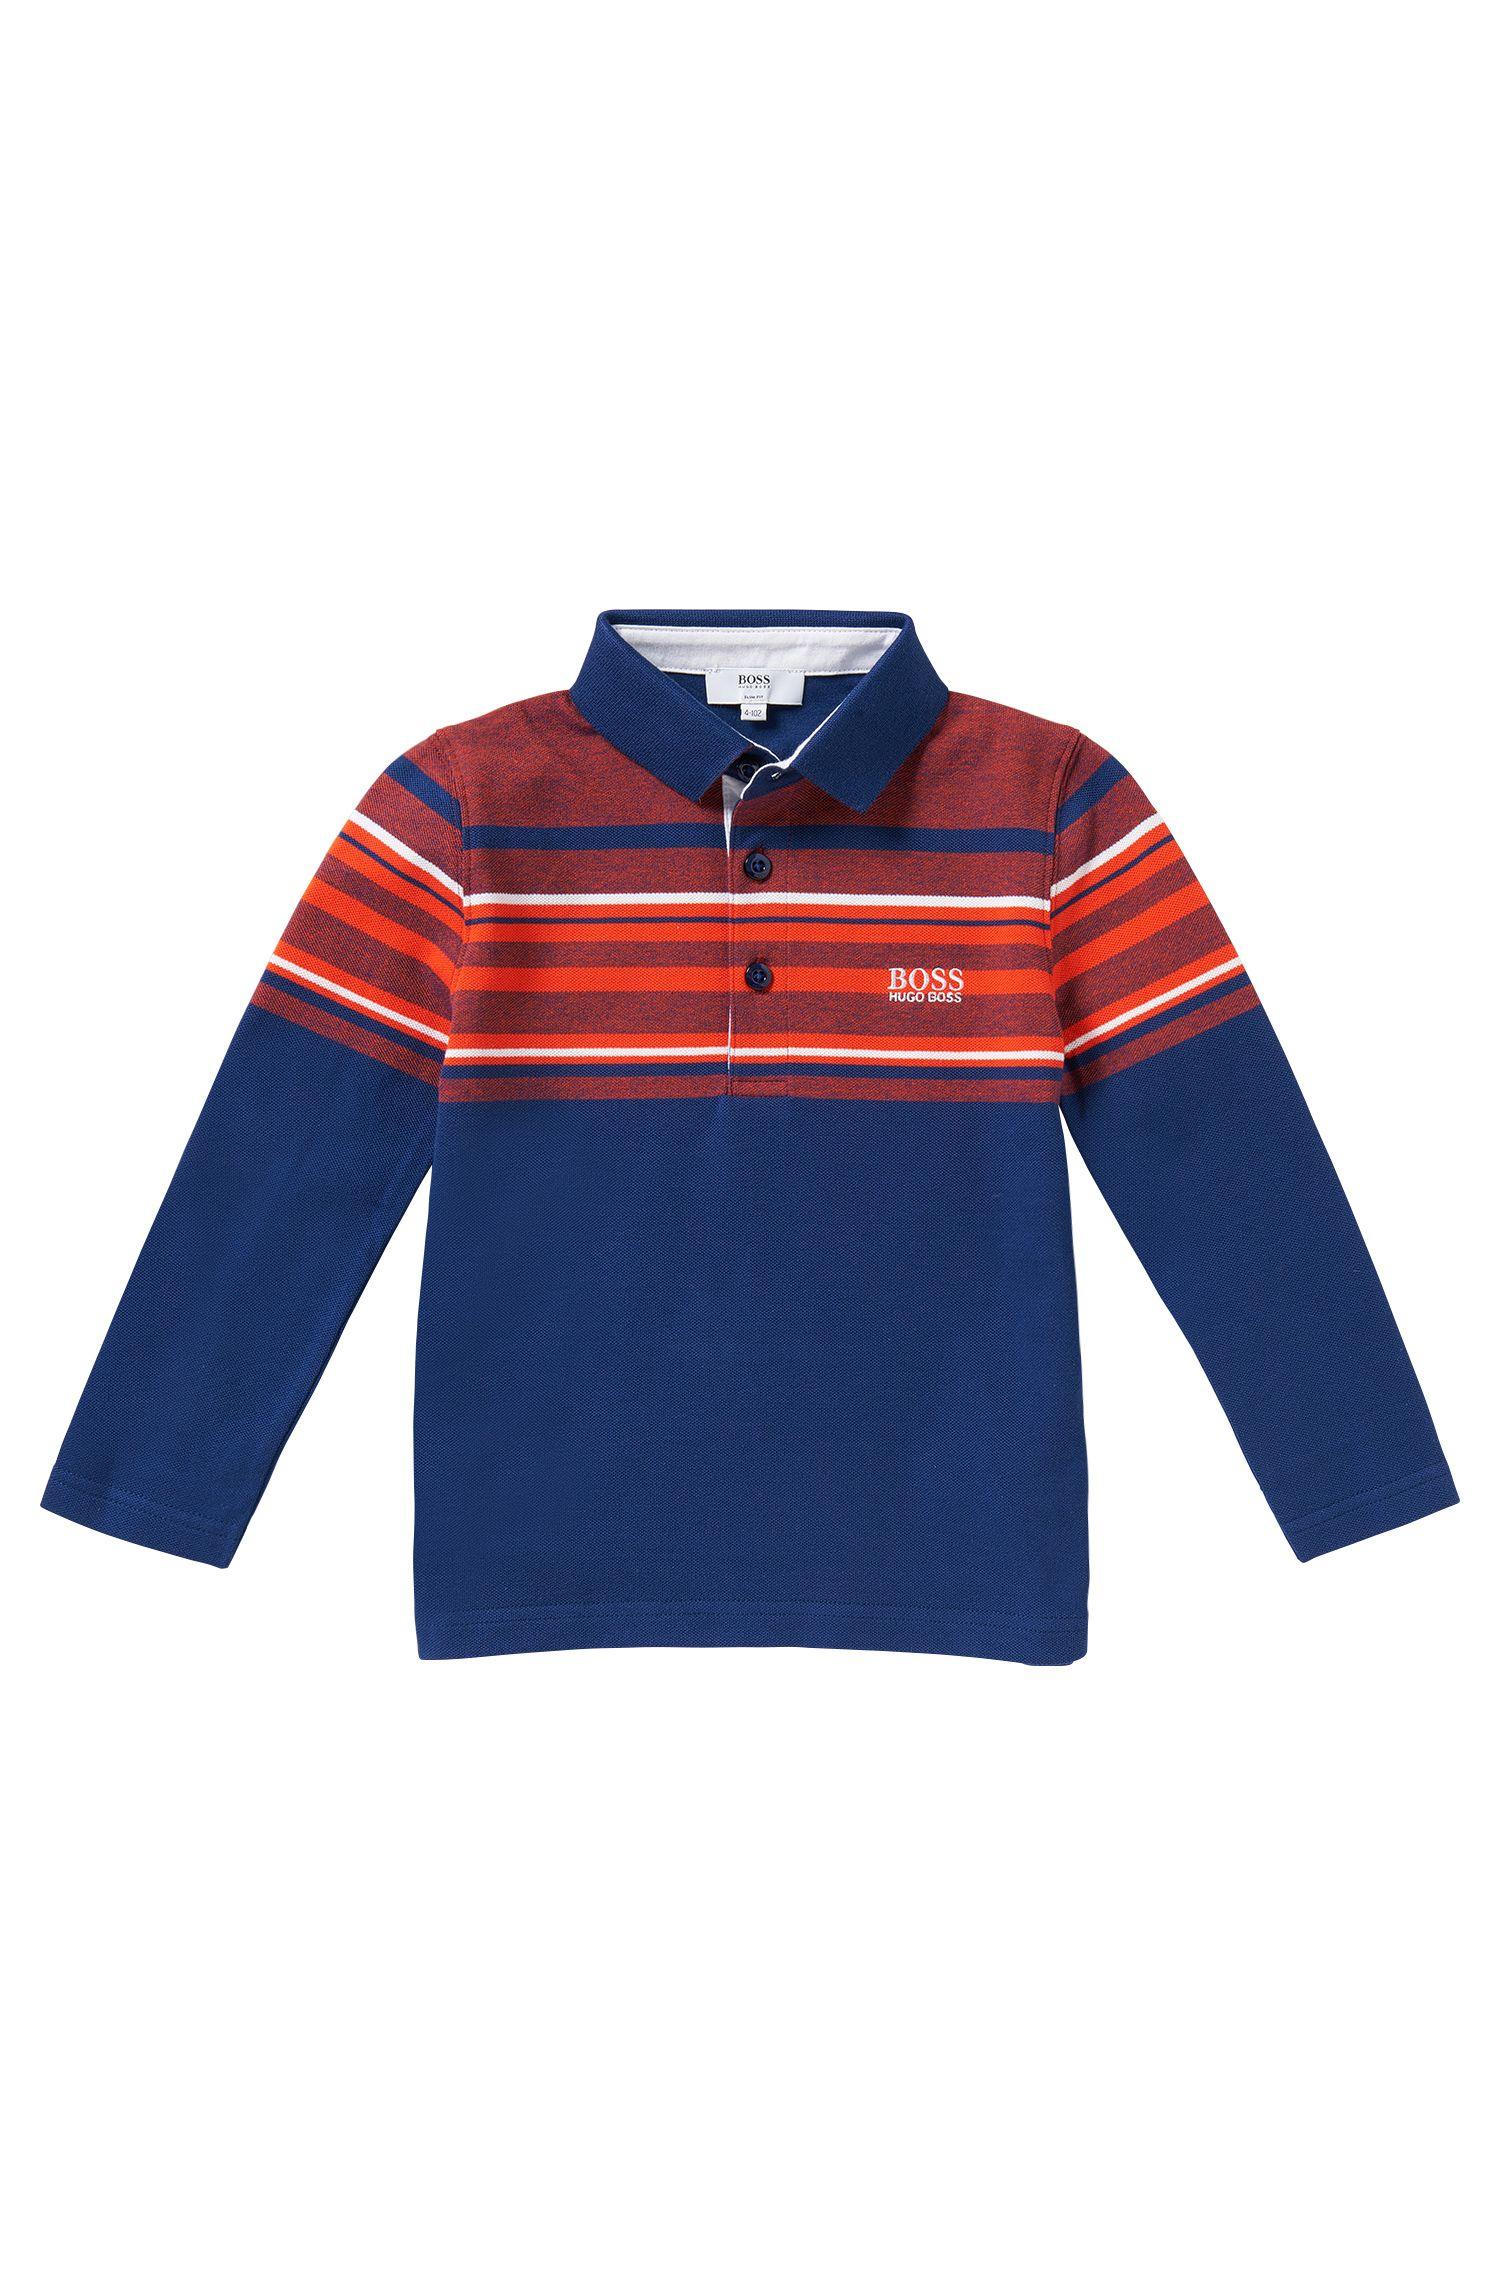 Kids-Polo aus Baumwolle: 'J25857'